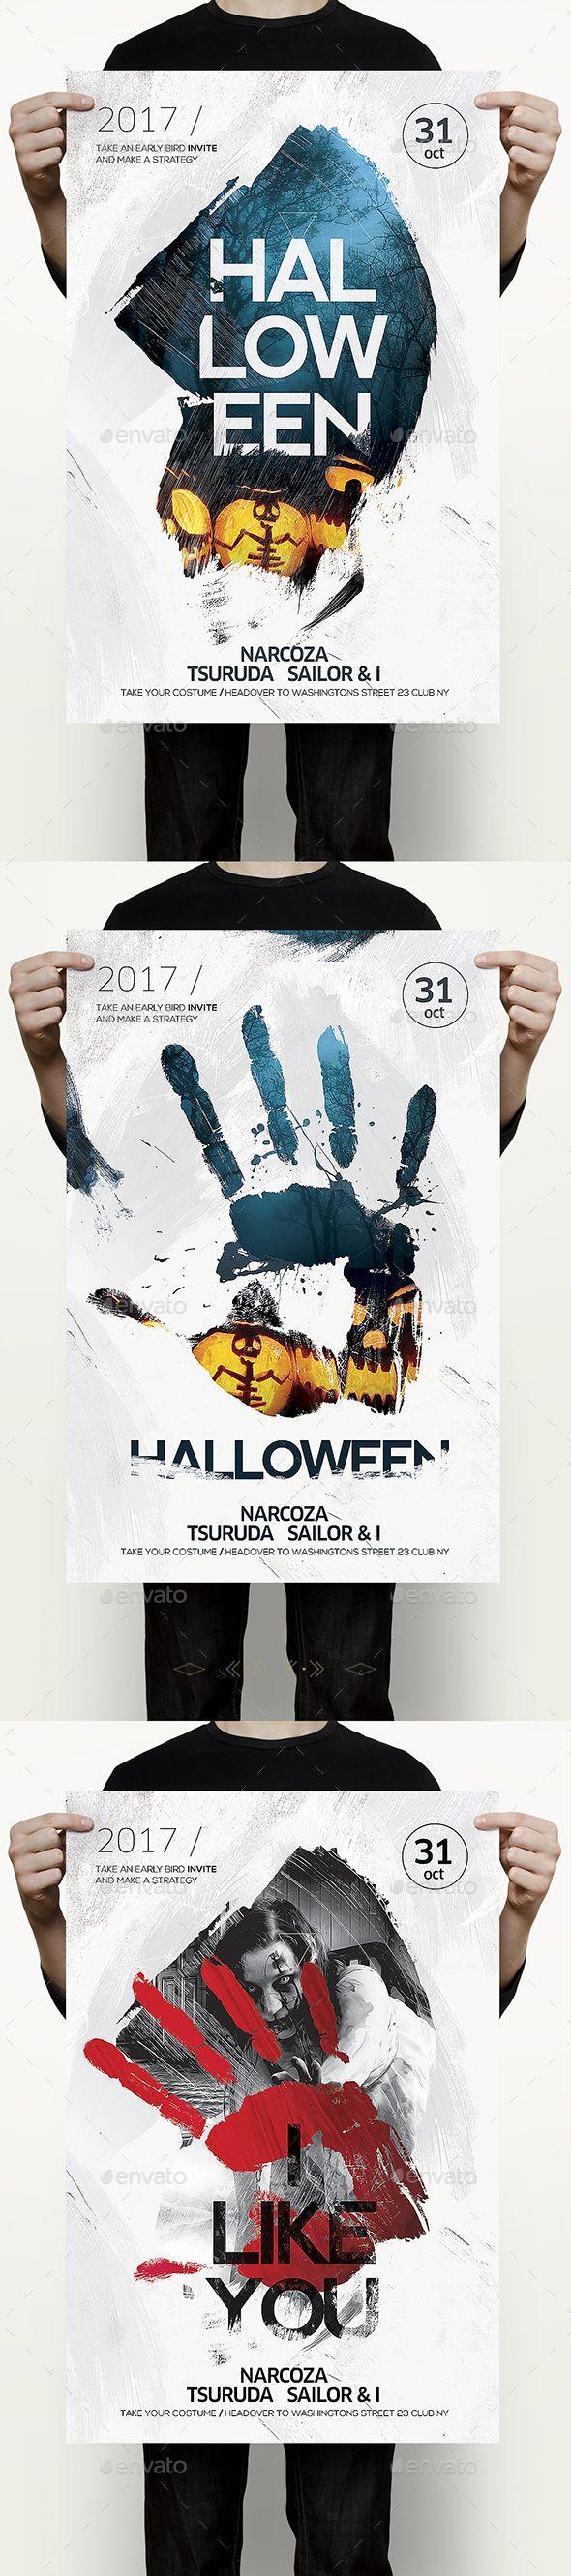 Halloween Flyer  — PSD Template #halloween Night #light • Download ➝ https://graphicriver.net/item/halloween-flyer/18145549?ref=pxcr